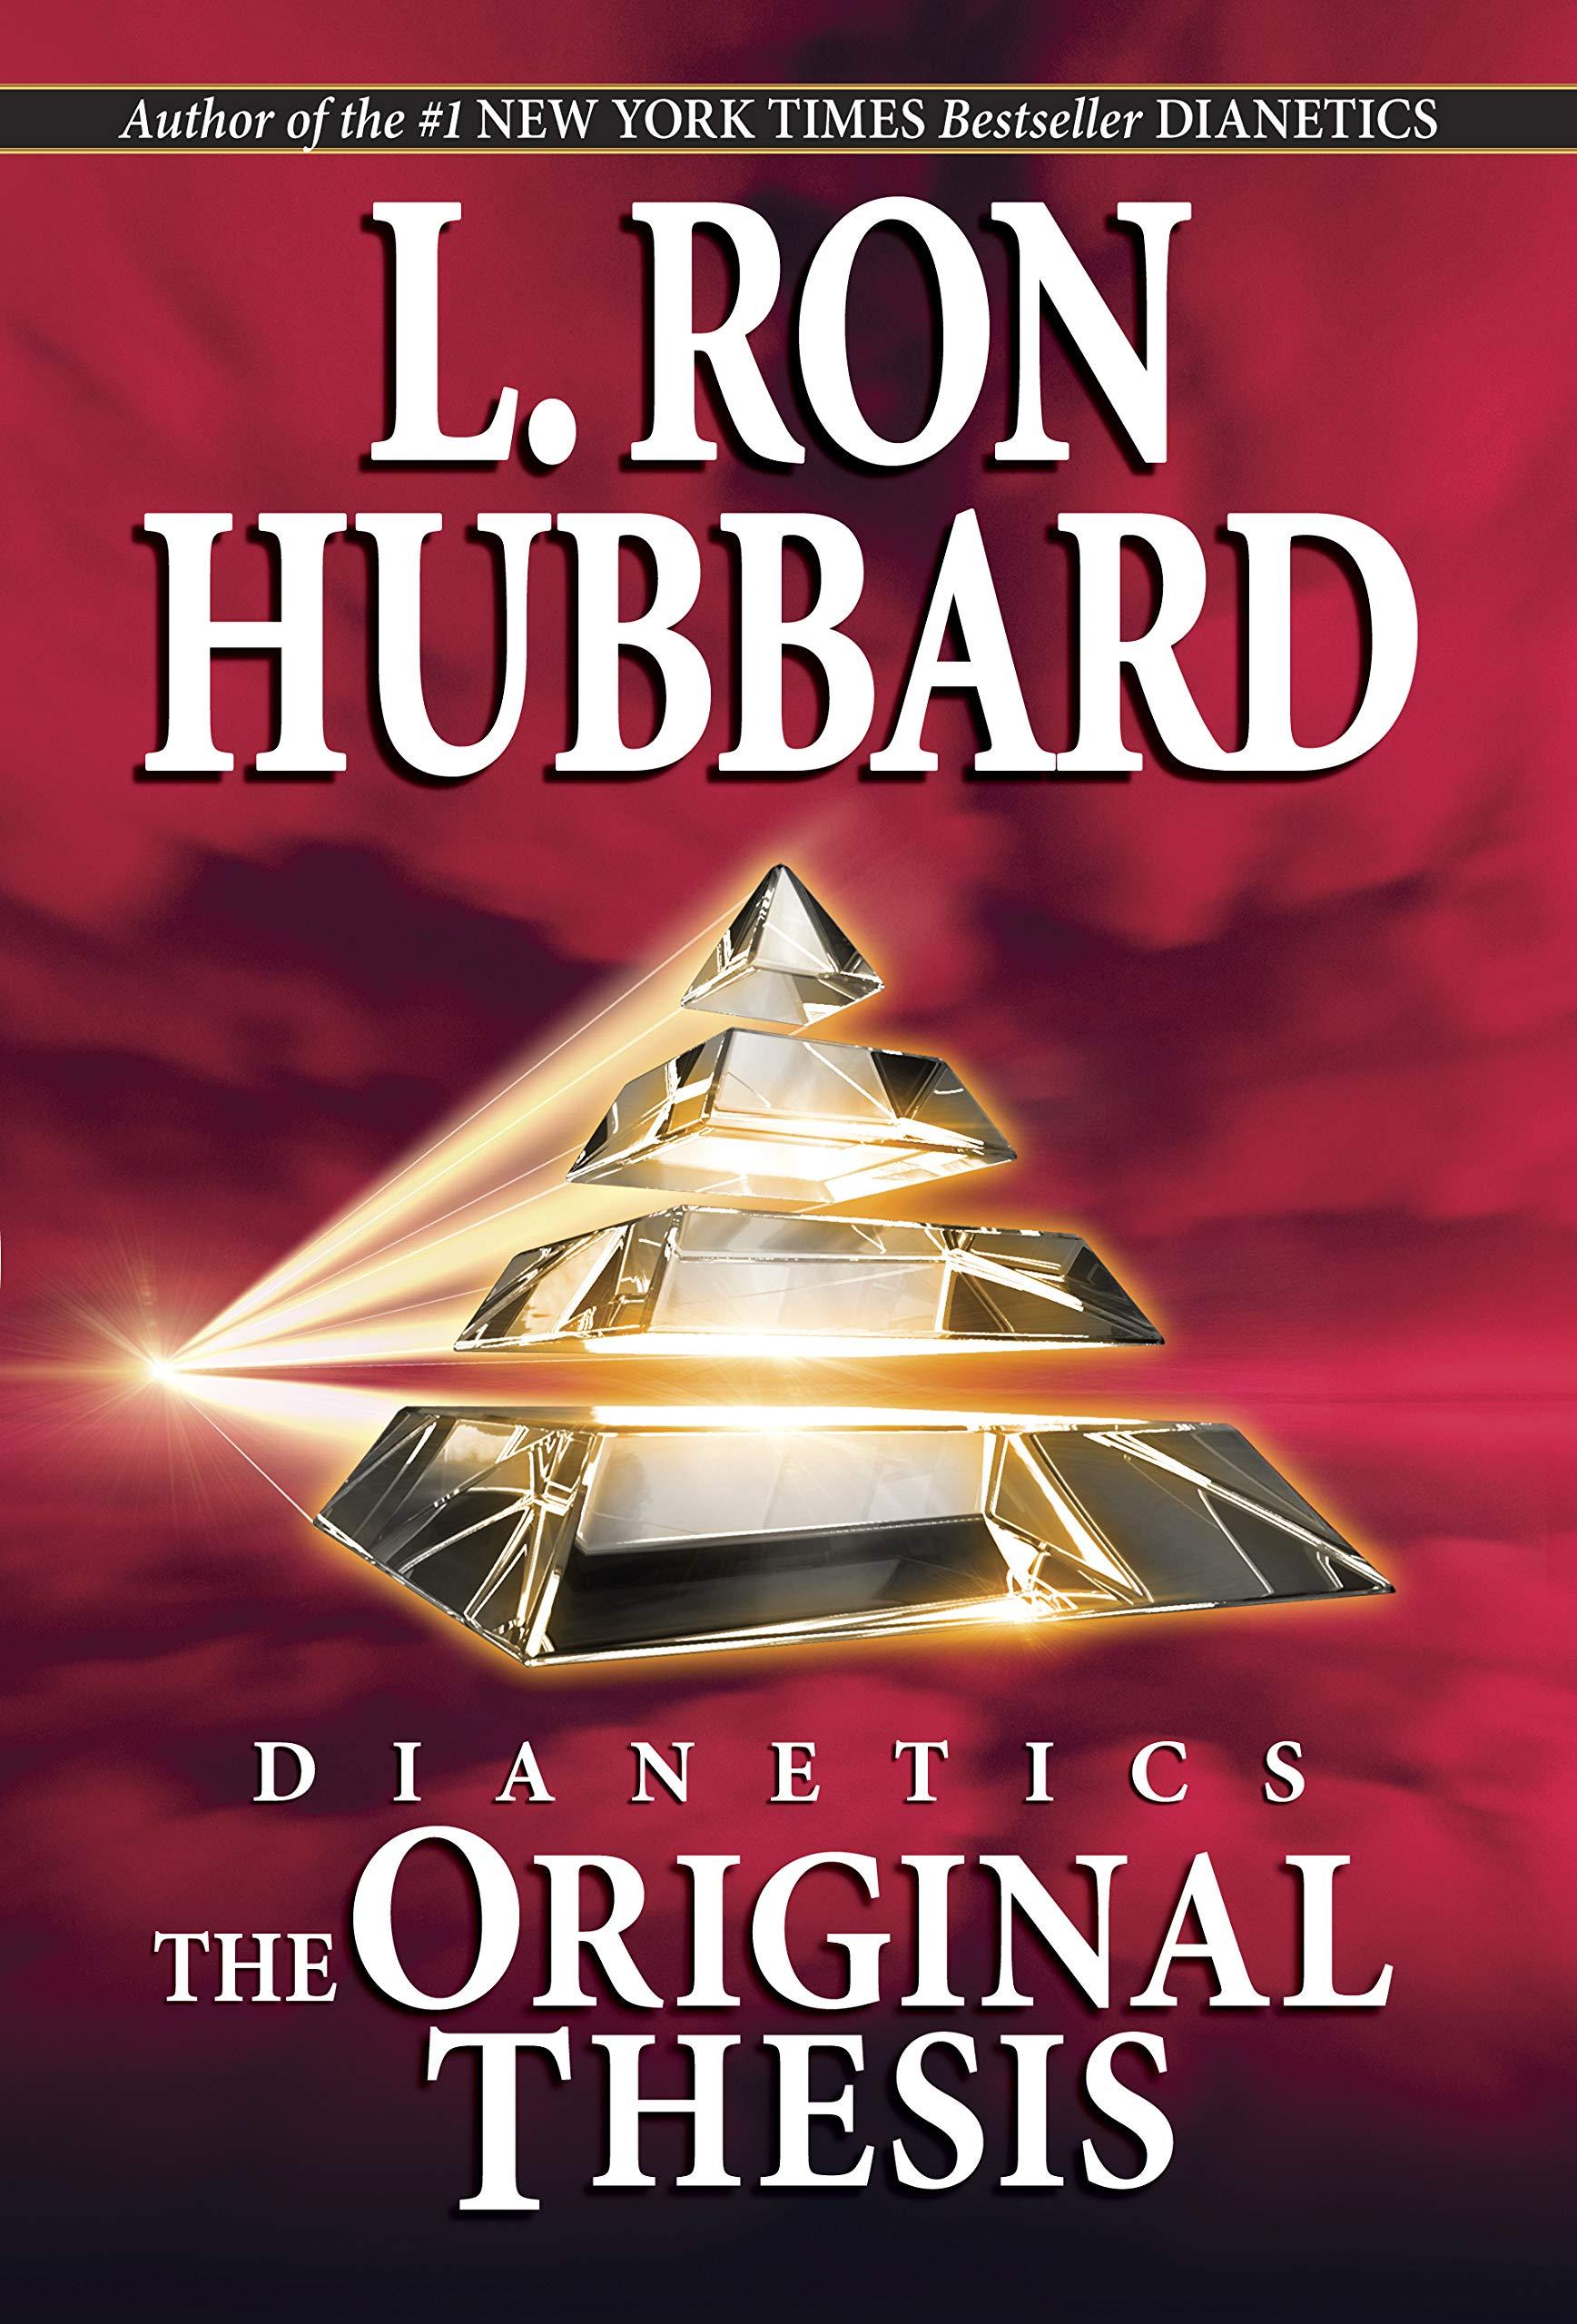 Dianetics: The Original Thesis: Amazon.es: Hubbard, L. Ron ...